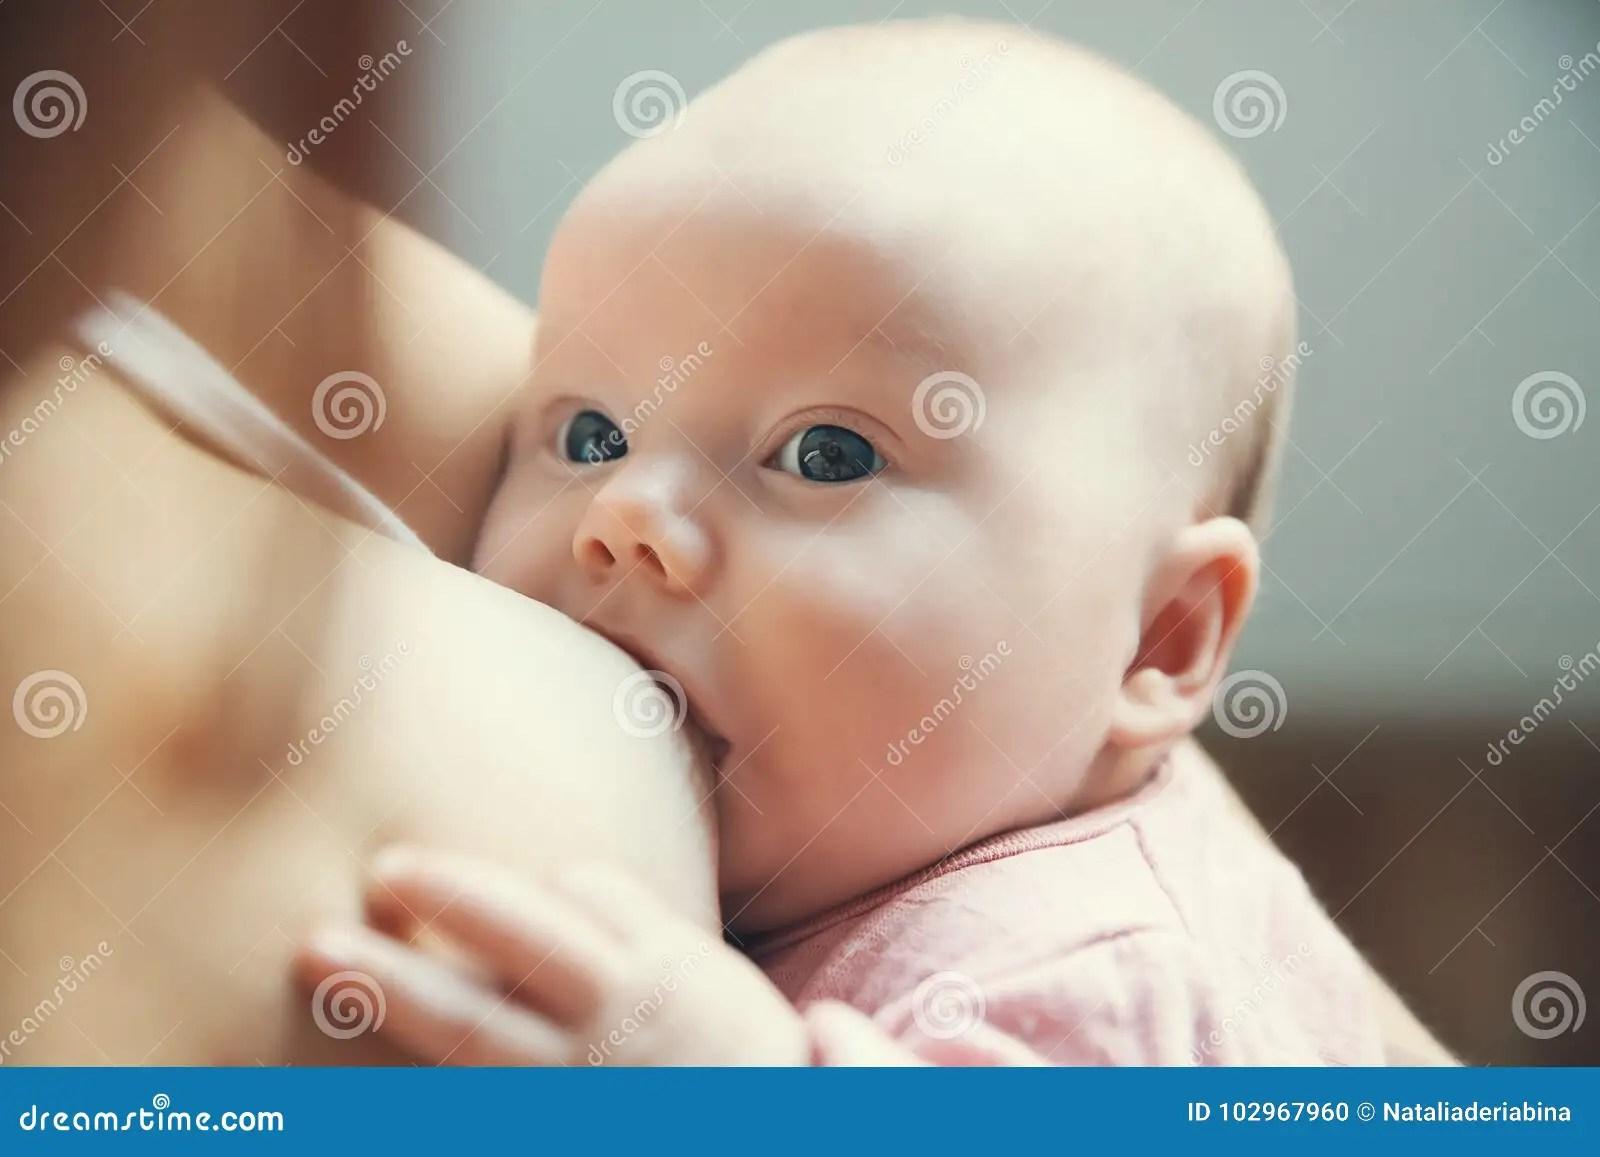 Mother Breastfeeding Newborn Baby Child Stock Photo